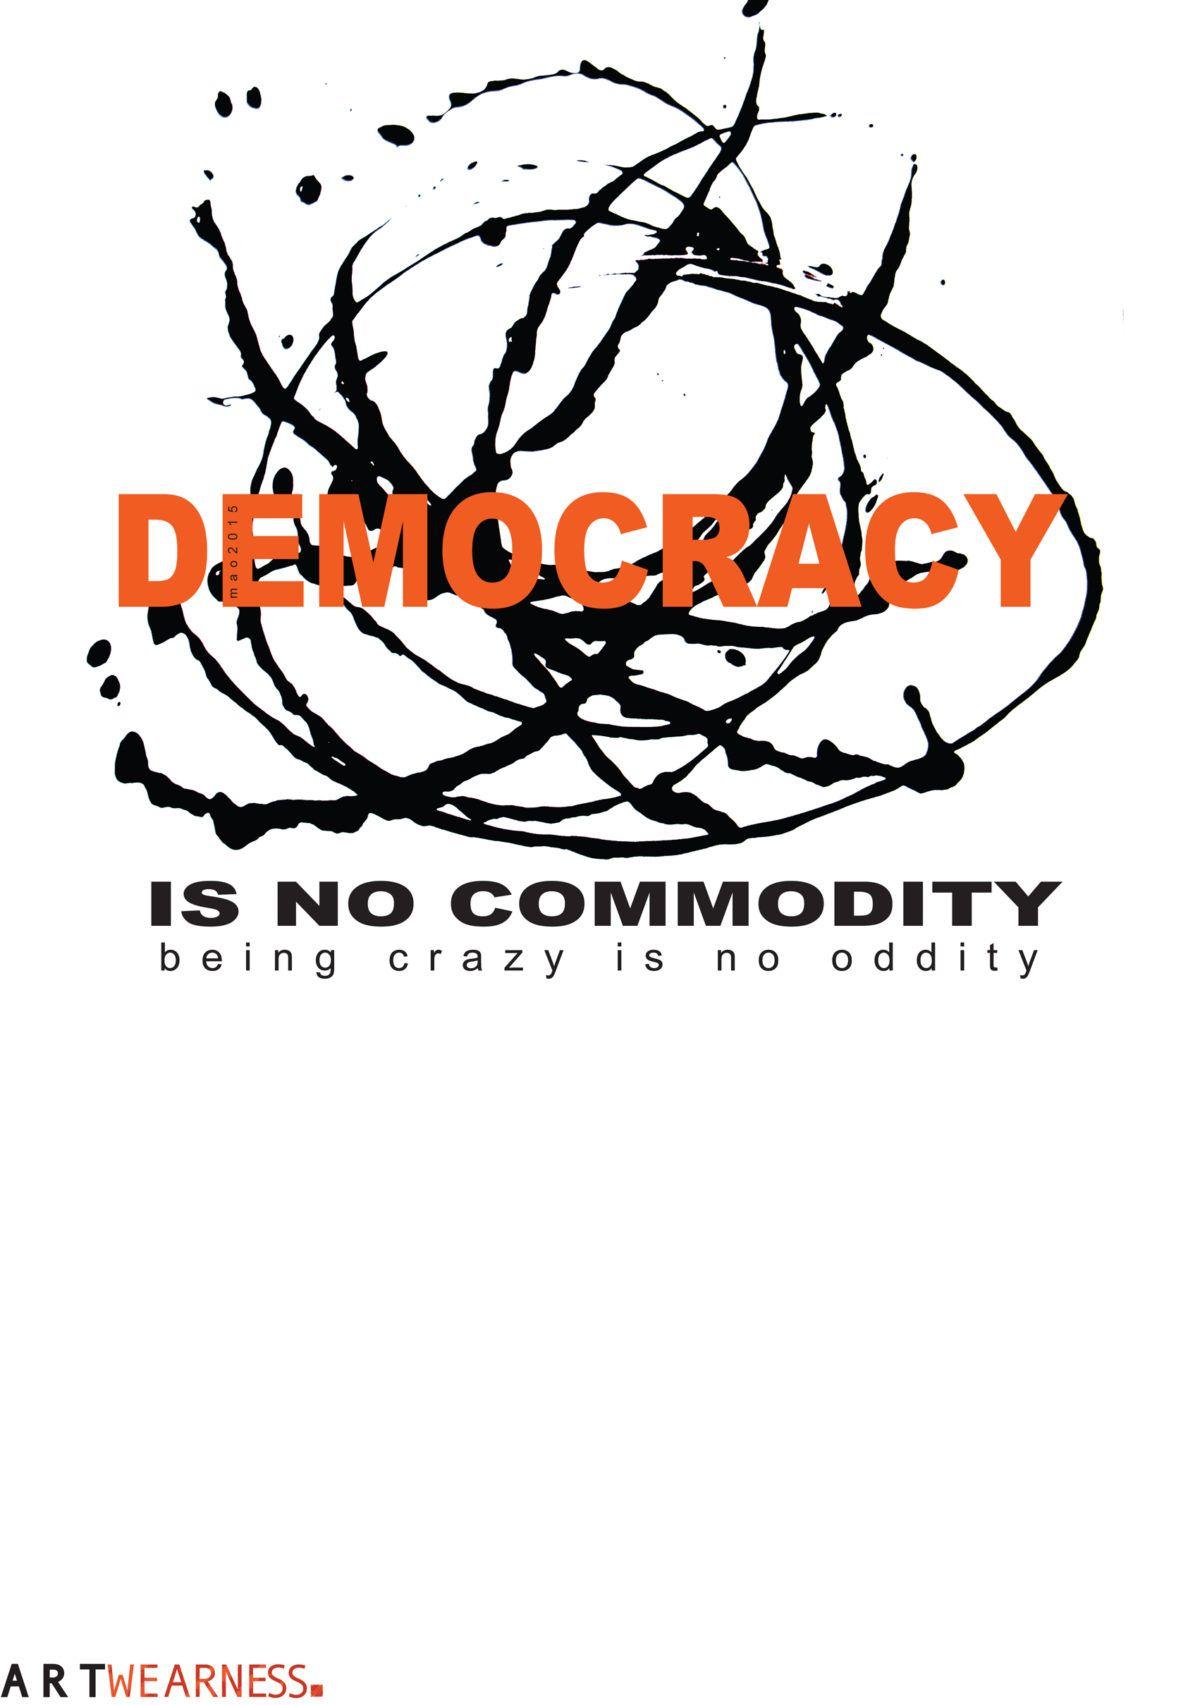 No Commodity